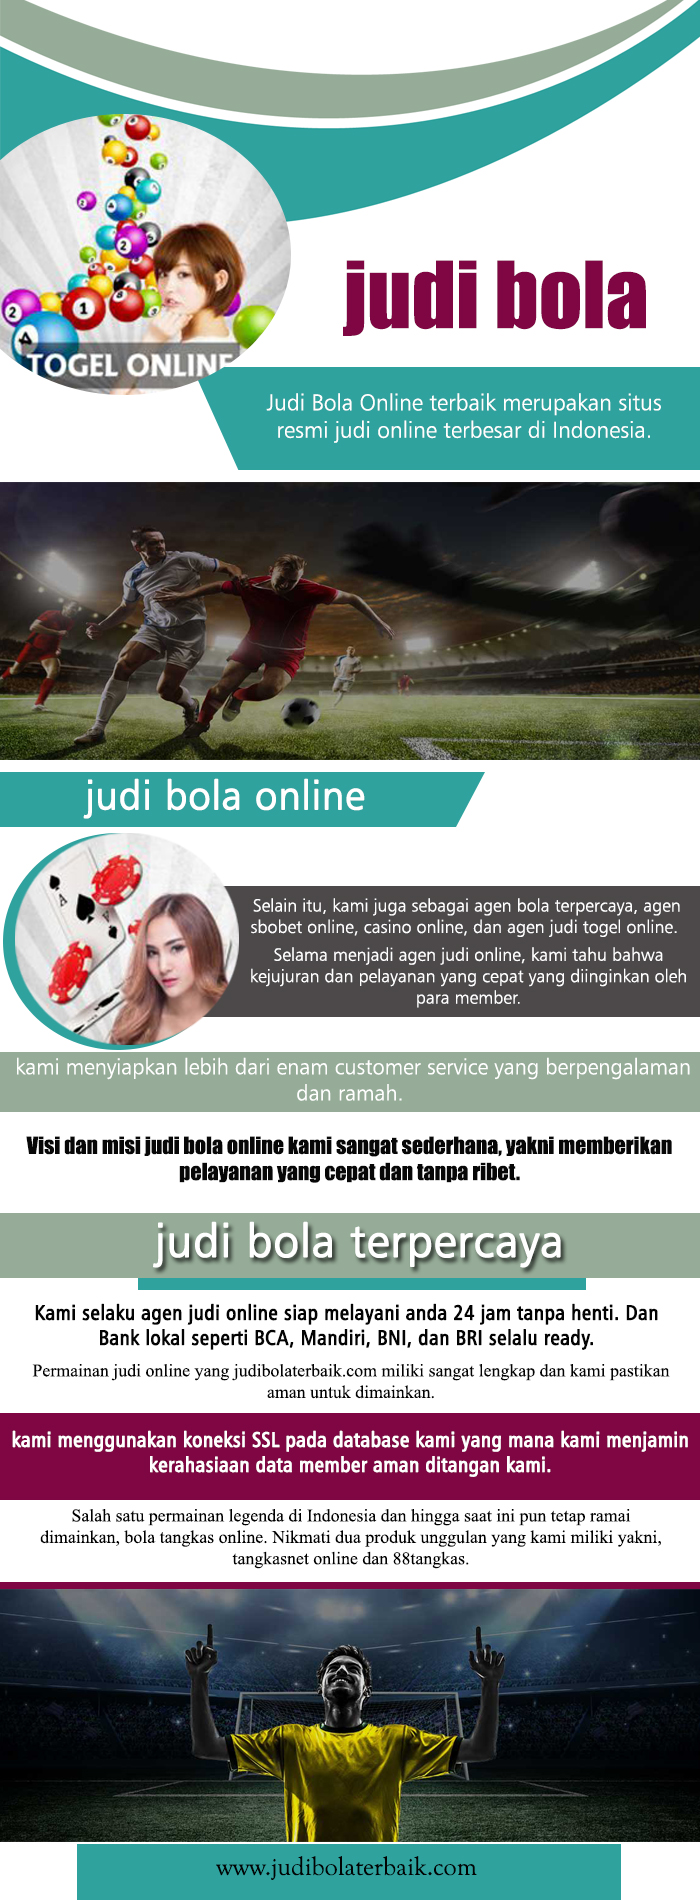 website judi bola indonesia